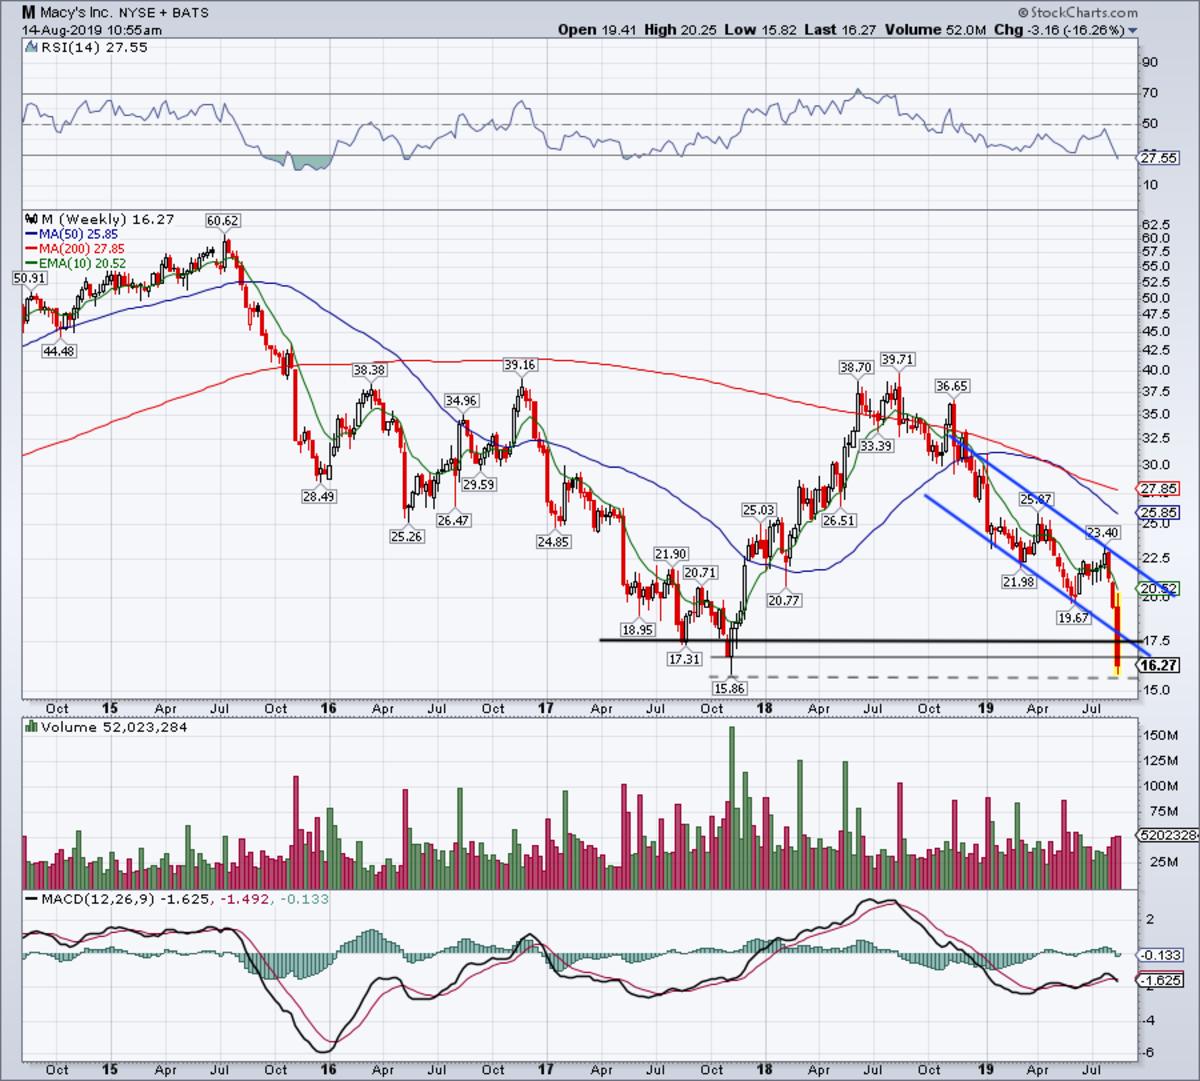 Weekly chart of Macy's stock.